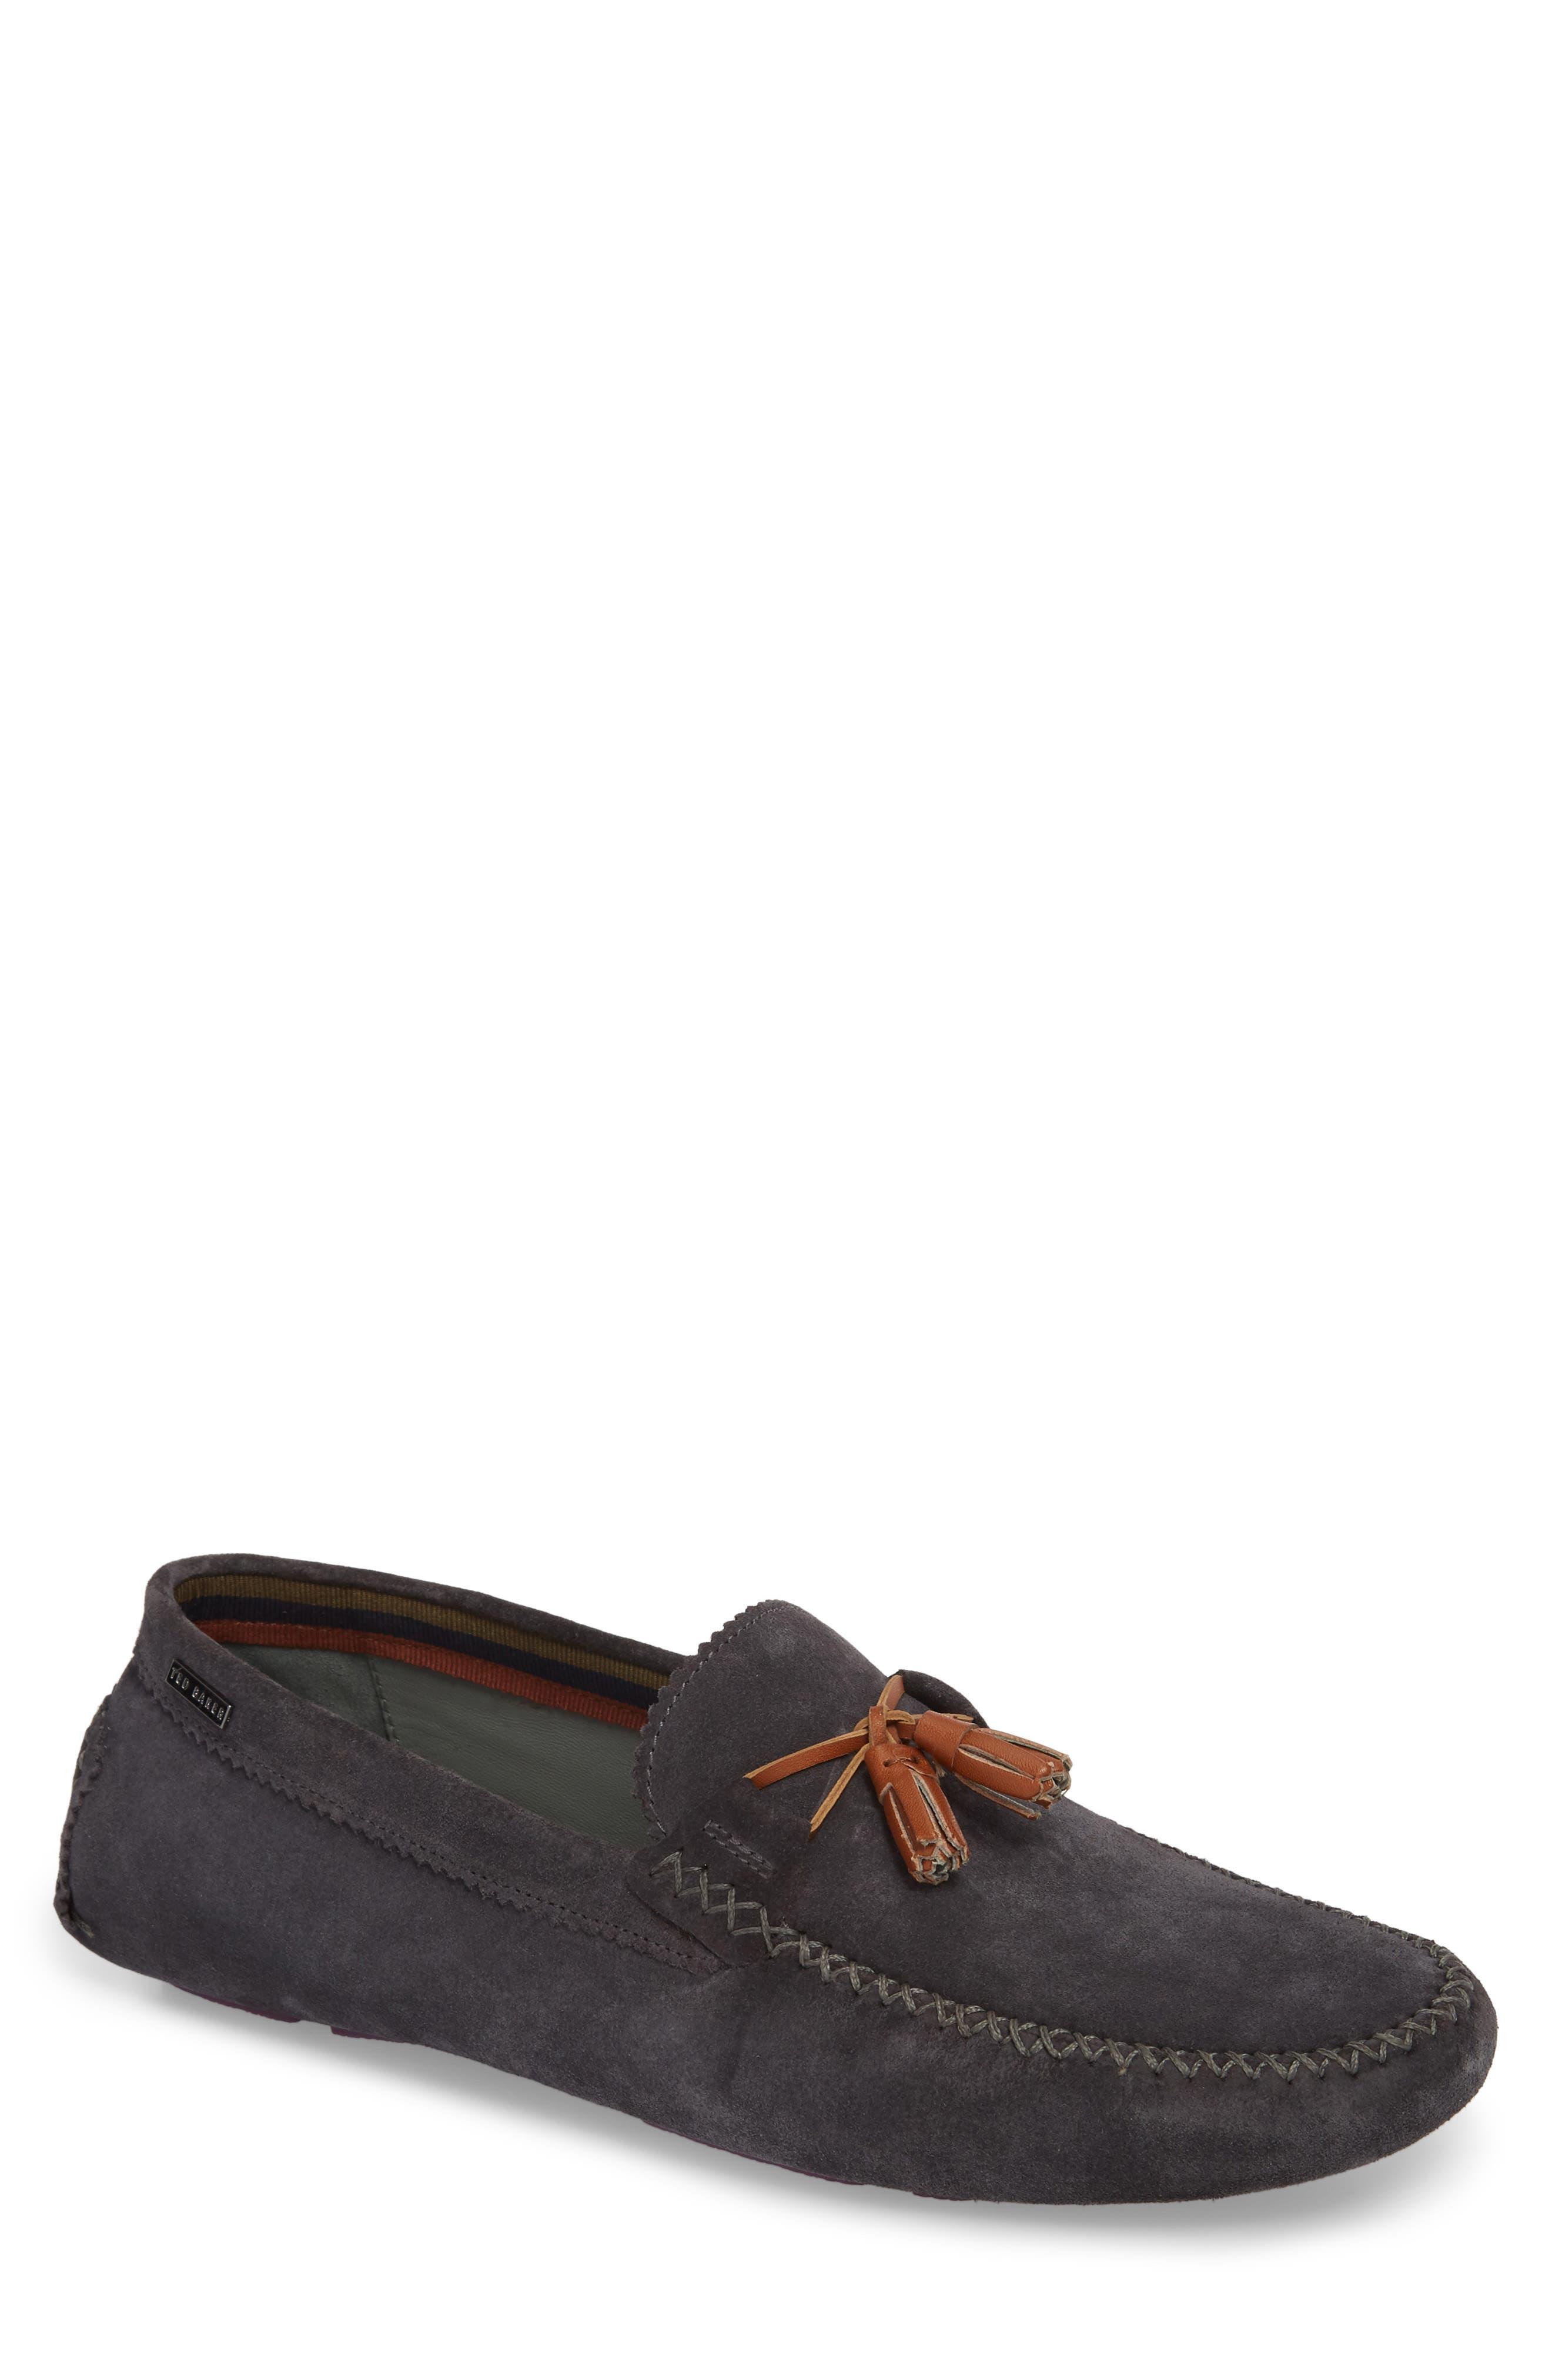 Urbonns Tasseled Driving Loafer,                             Main thumbnail 1, color,                             070